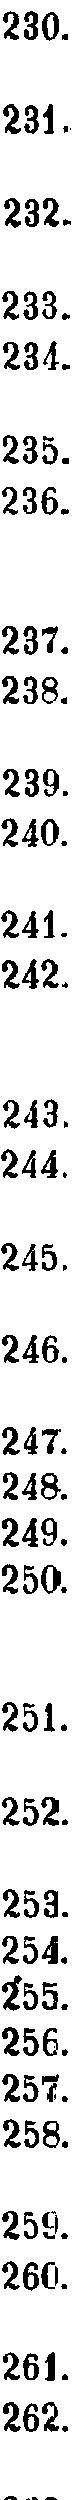 [merged small][merged small][merged small][merged small][merged small][merged small][merged small][merged small][merged small][merged small][merged small][ocr errors][merged small][merged small][merged small][merged small][merged small]